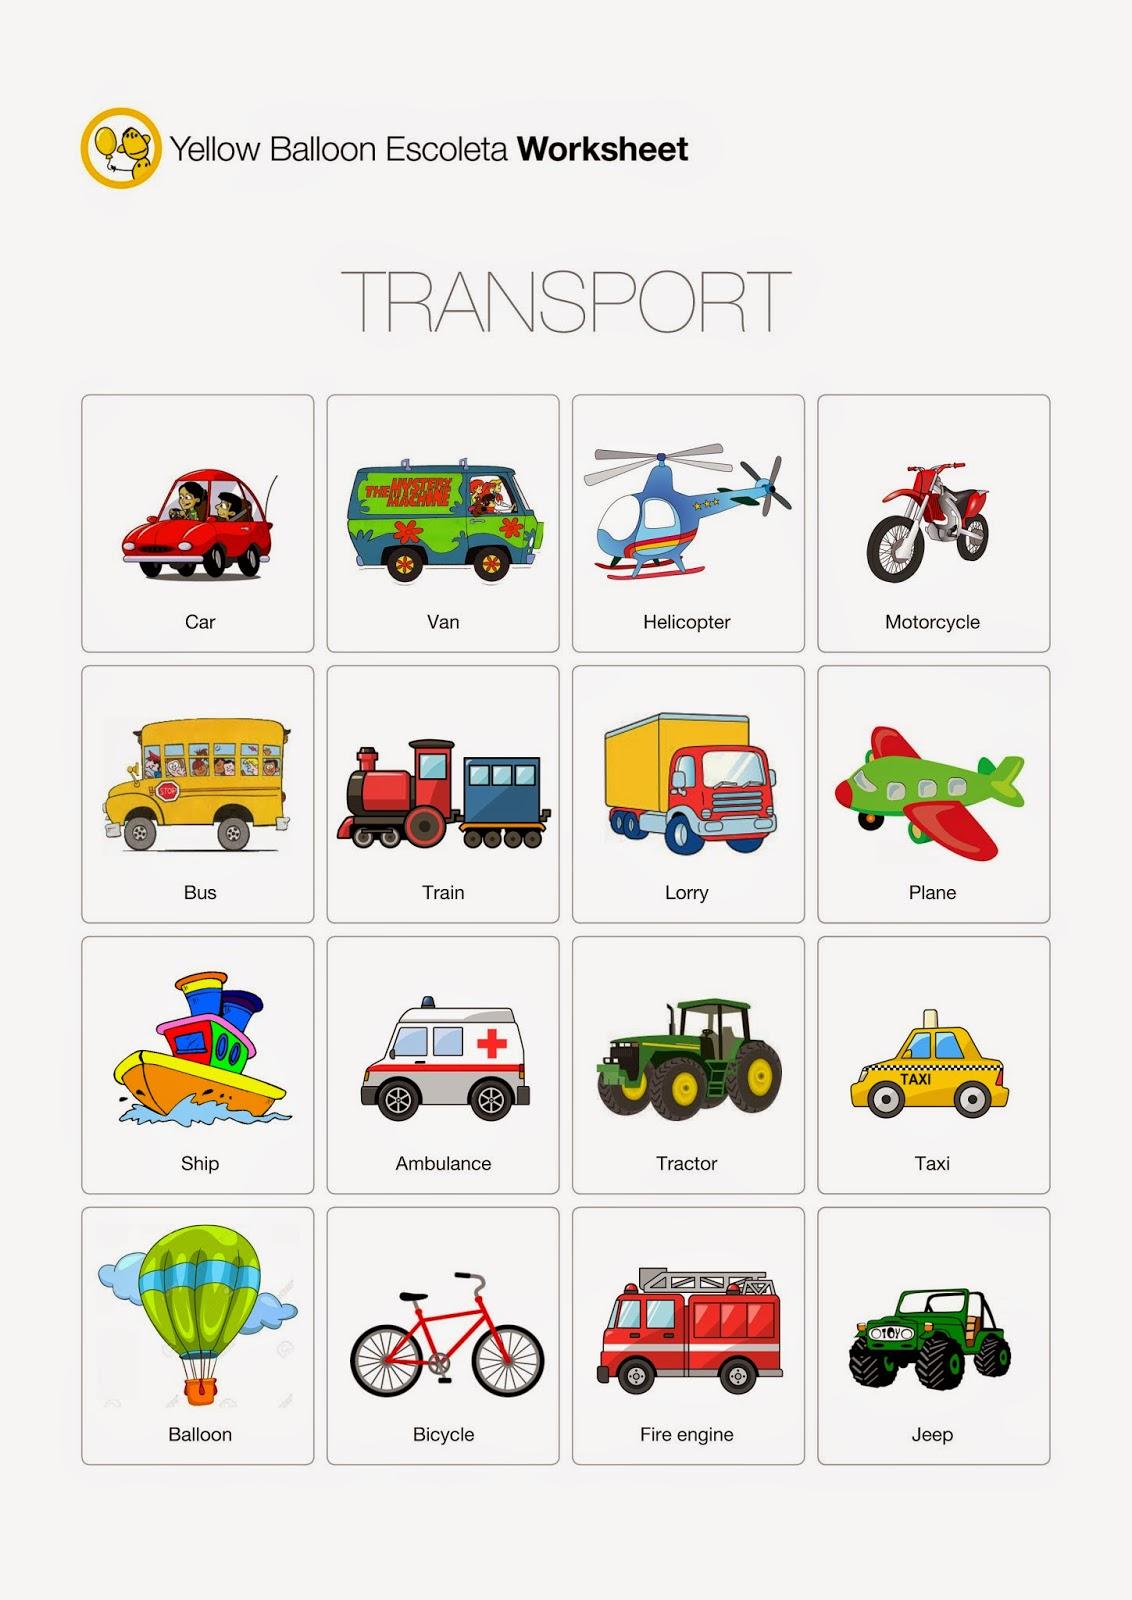 Yellow Balloon Escoleta Transport Worksheet